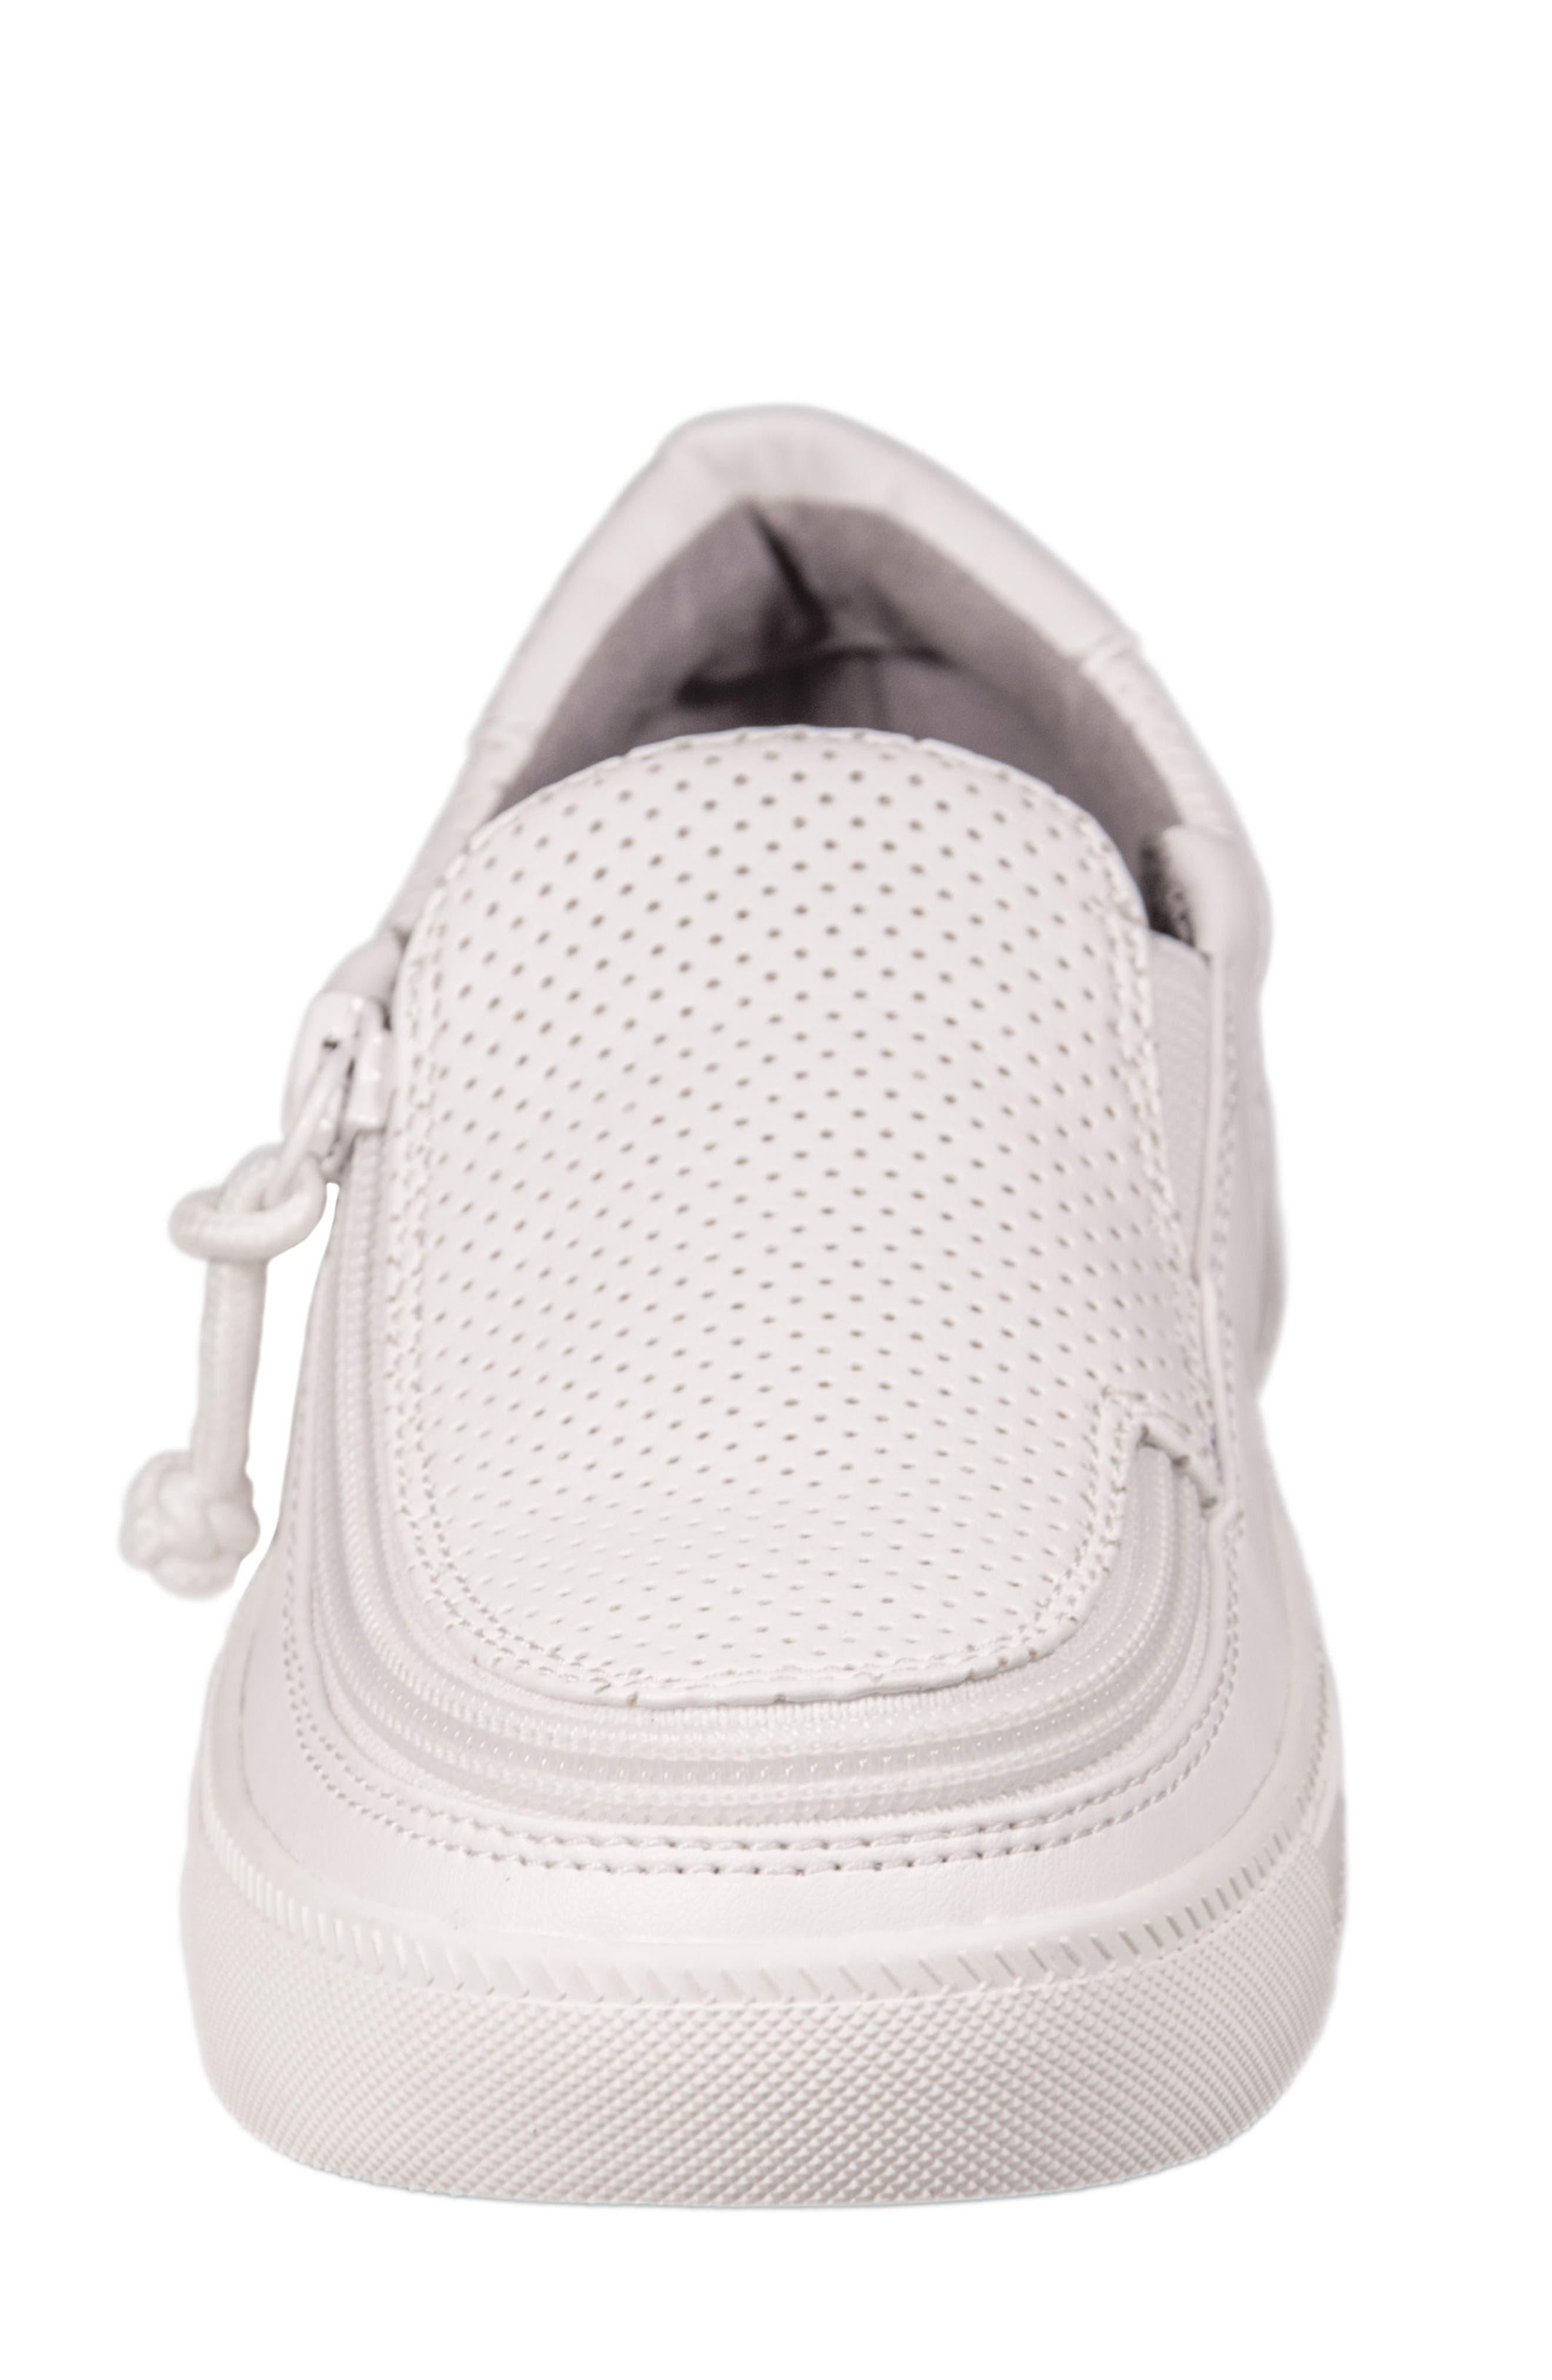 Zip Around Perforated Low Top Sneaker,                             Alternate thumbnail 6, color,